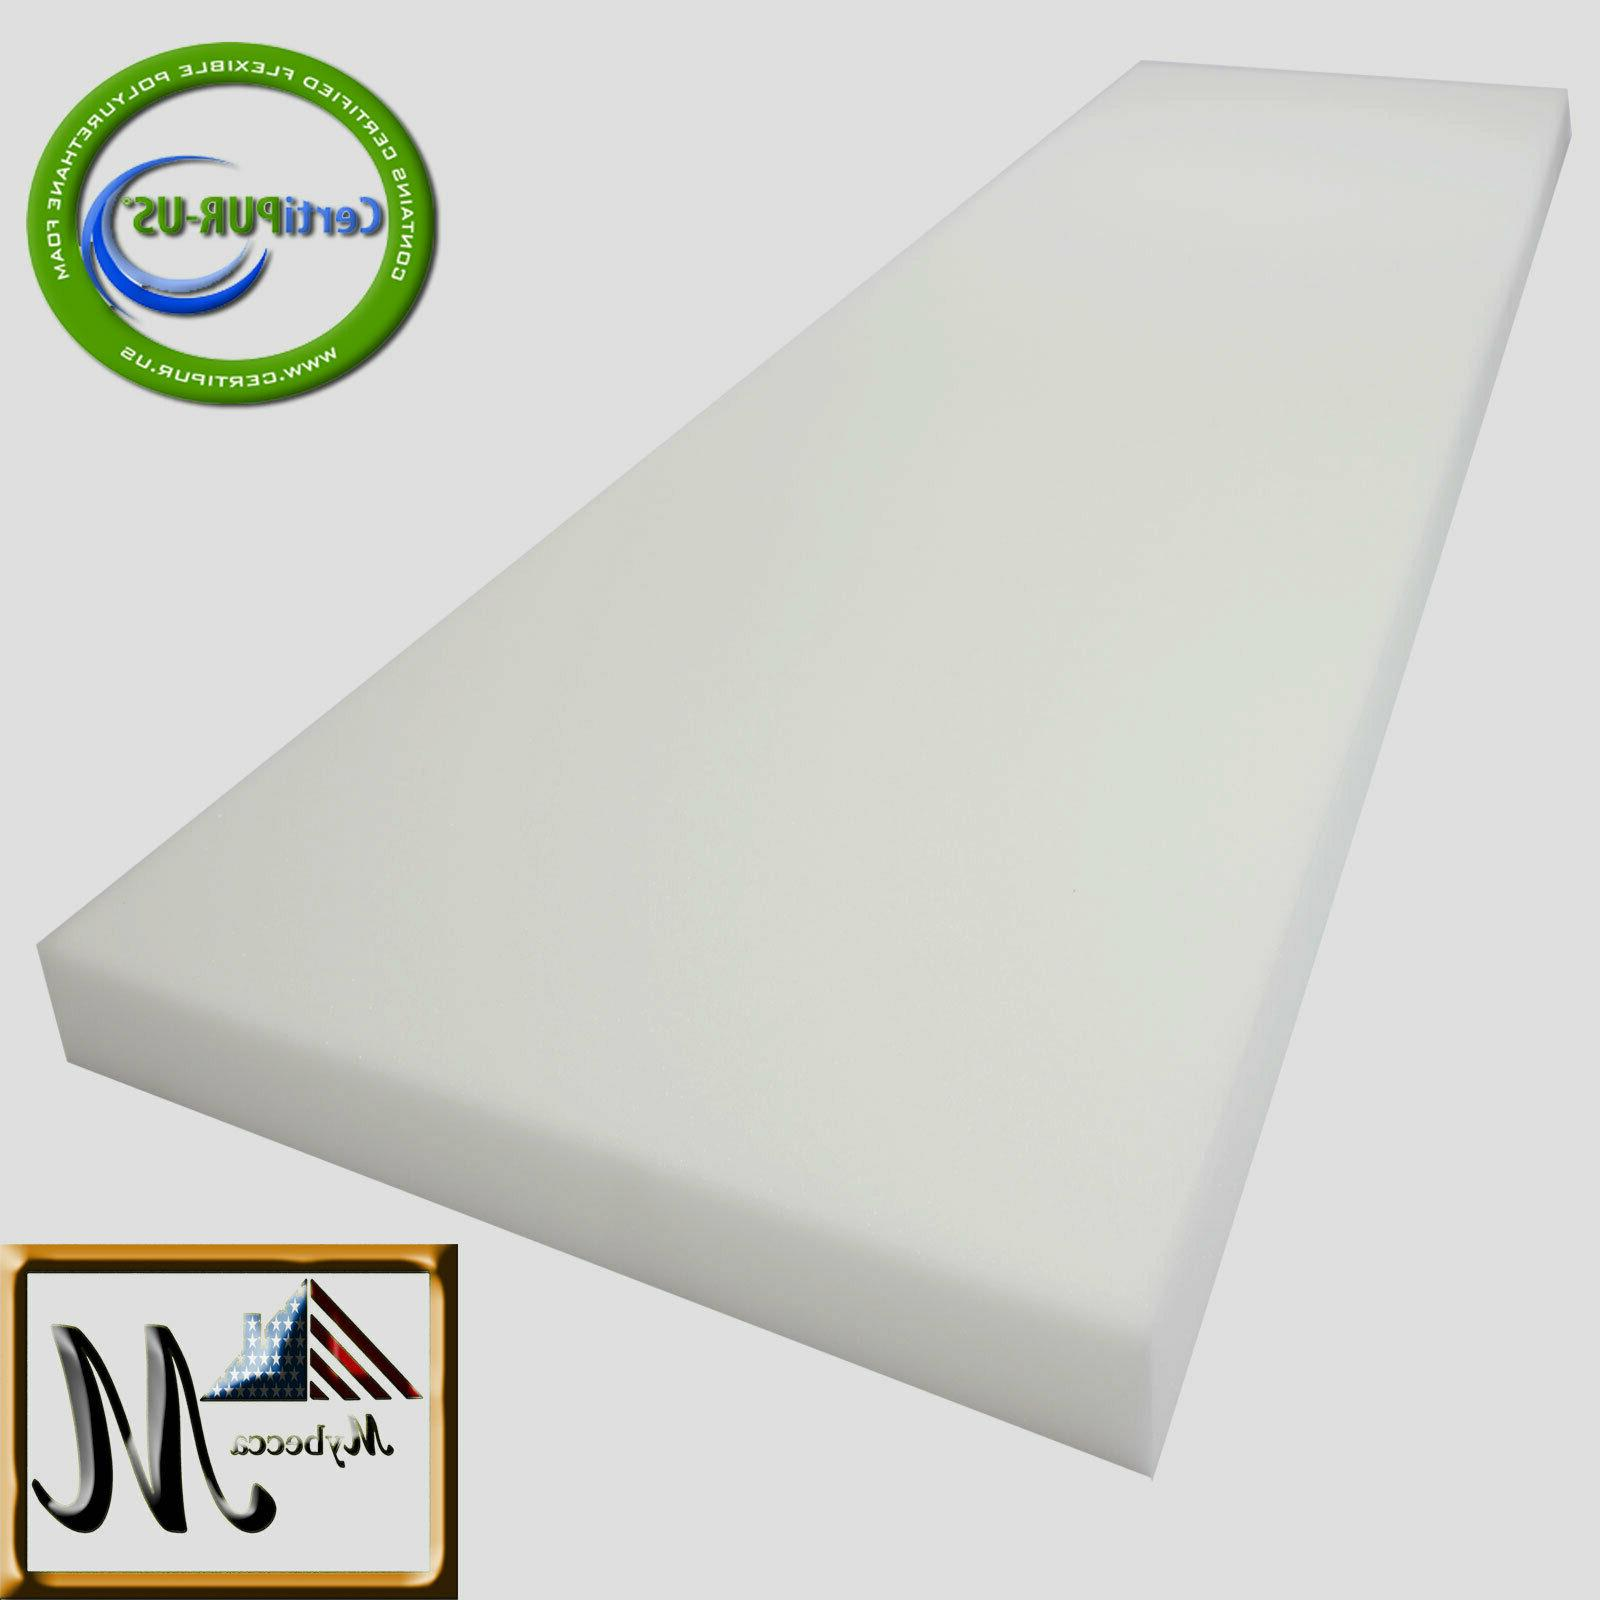 medium density upholstery foam cushion seat replacement